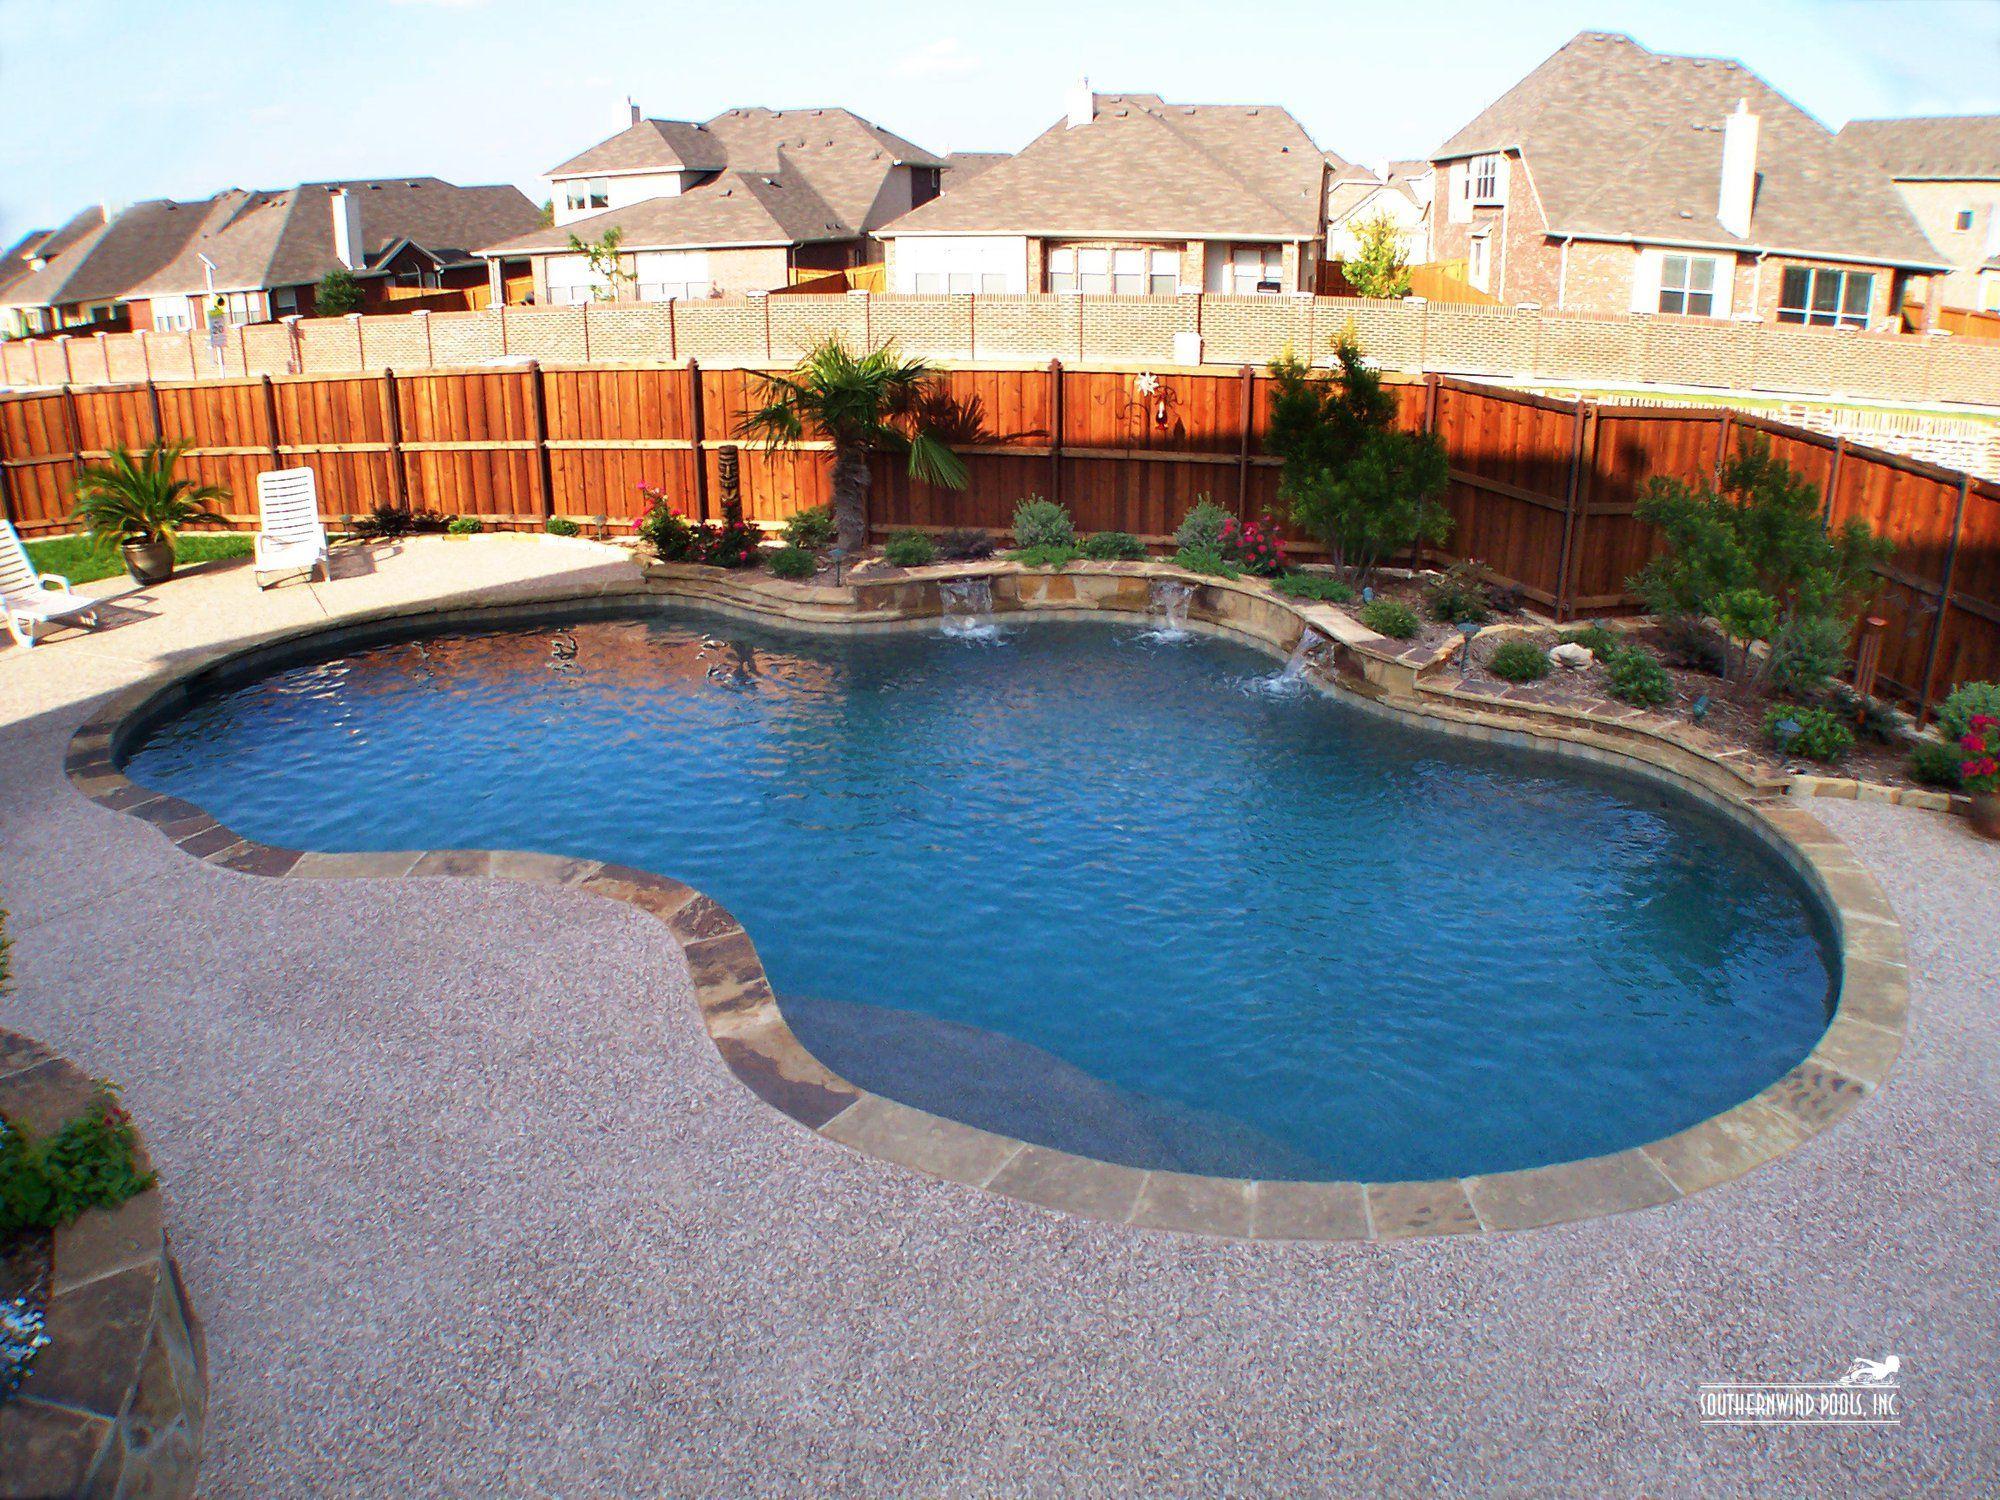 Pearland | Custom inground pools, Pool, Freeform pools |Small Freeform Pools With Waterfalls